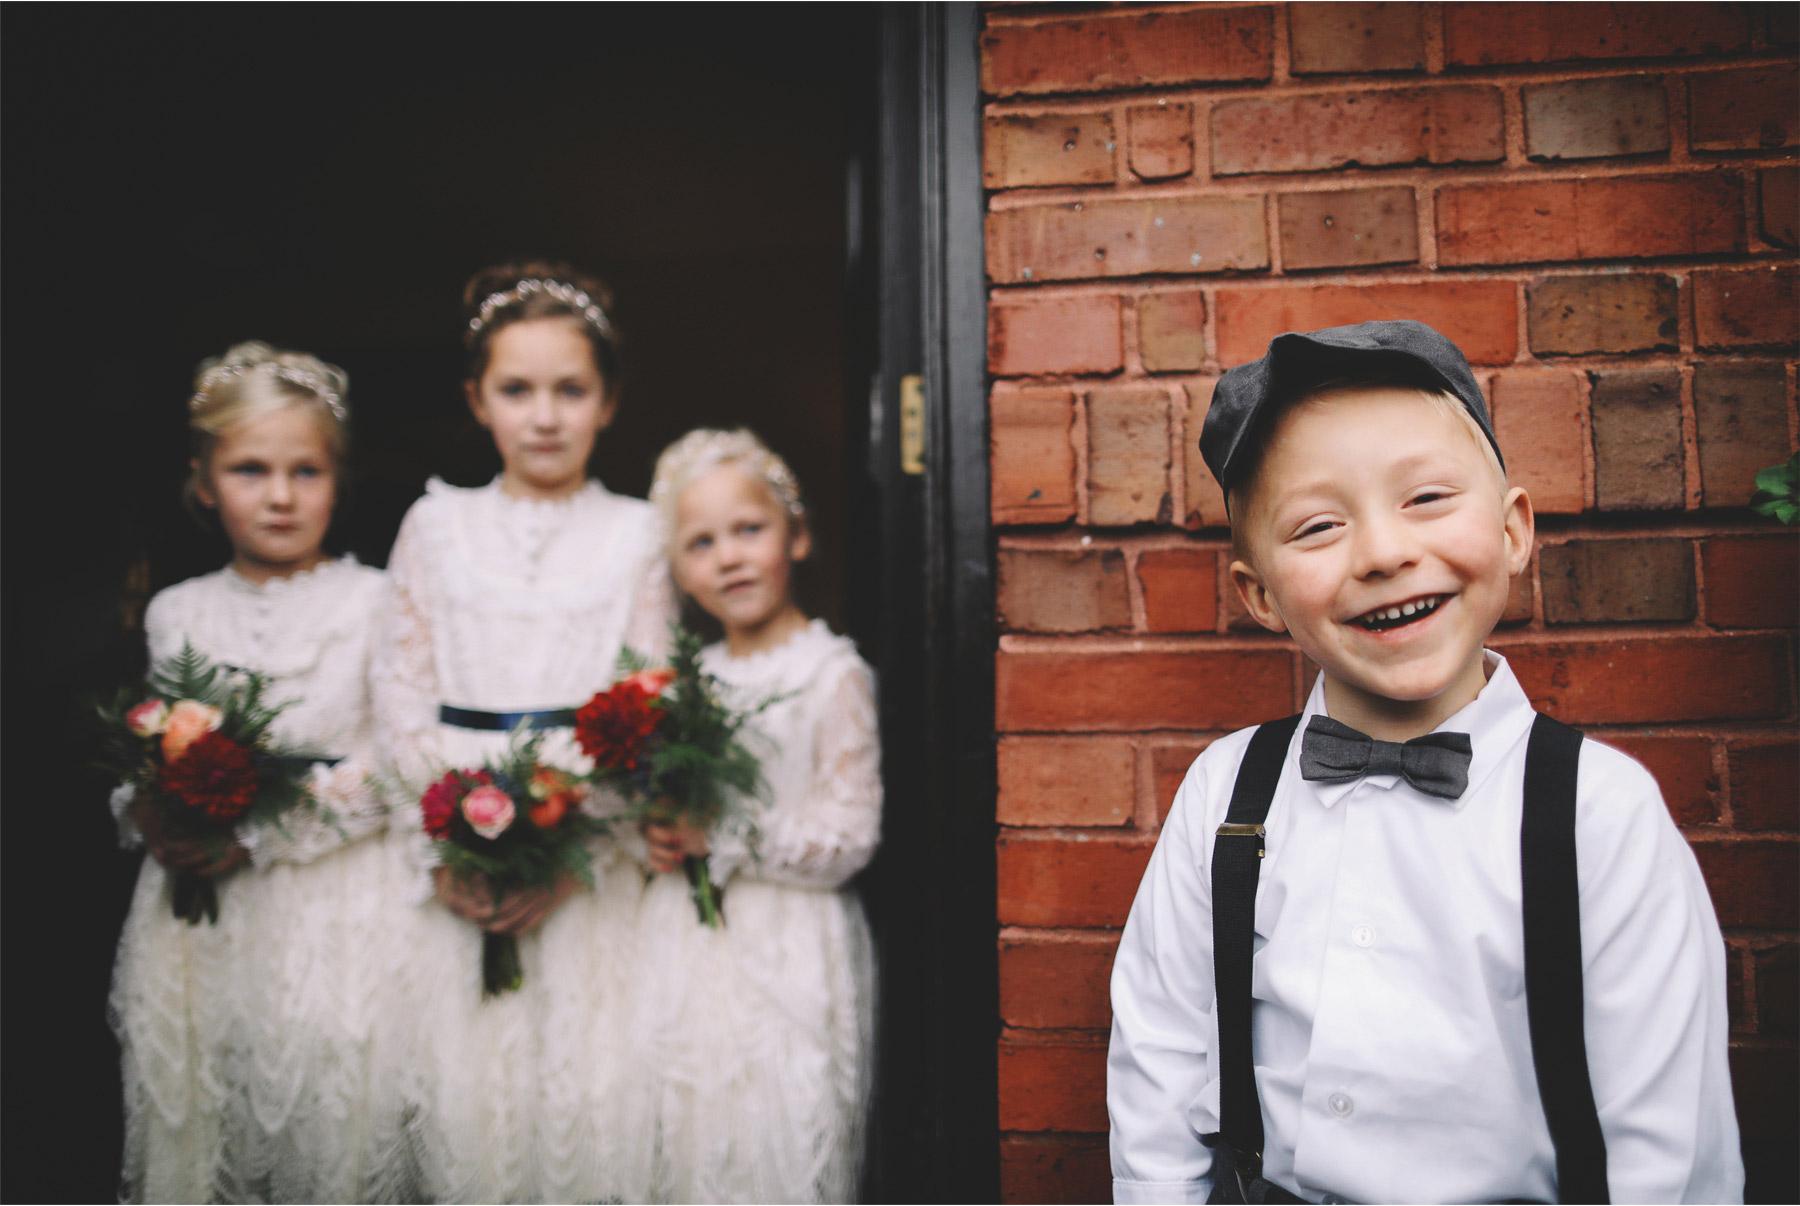 09-Duluth-Minnesota-Wedding-Photography-by-Vick-Photography-Glensheen-Mansion-FLower-Girls-Kelli-and-Marc.jpg